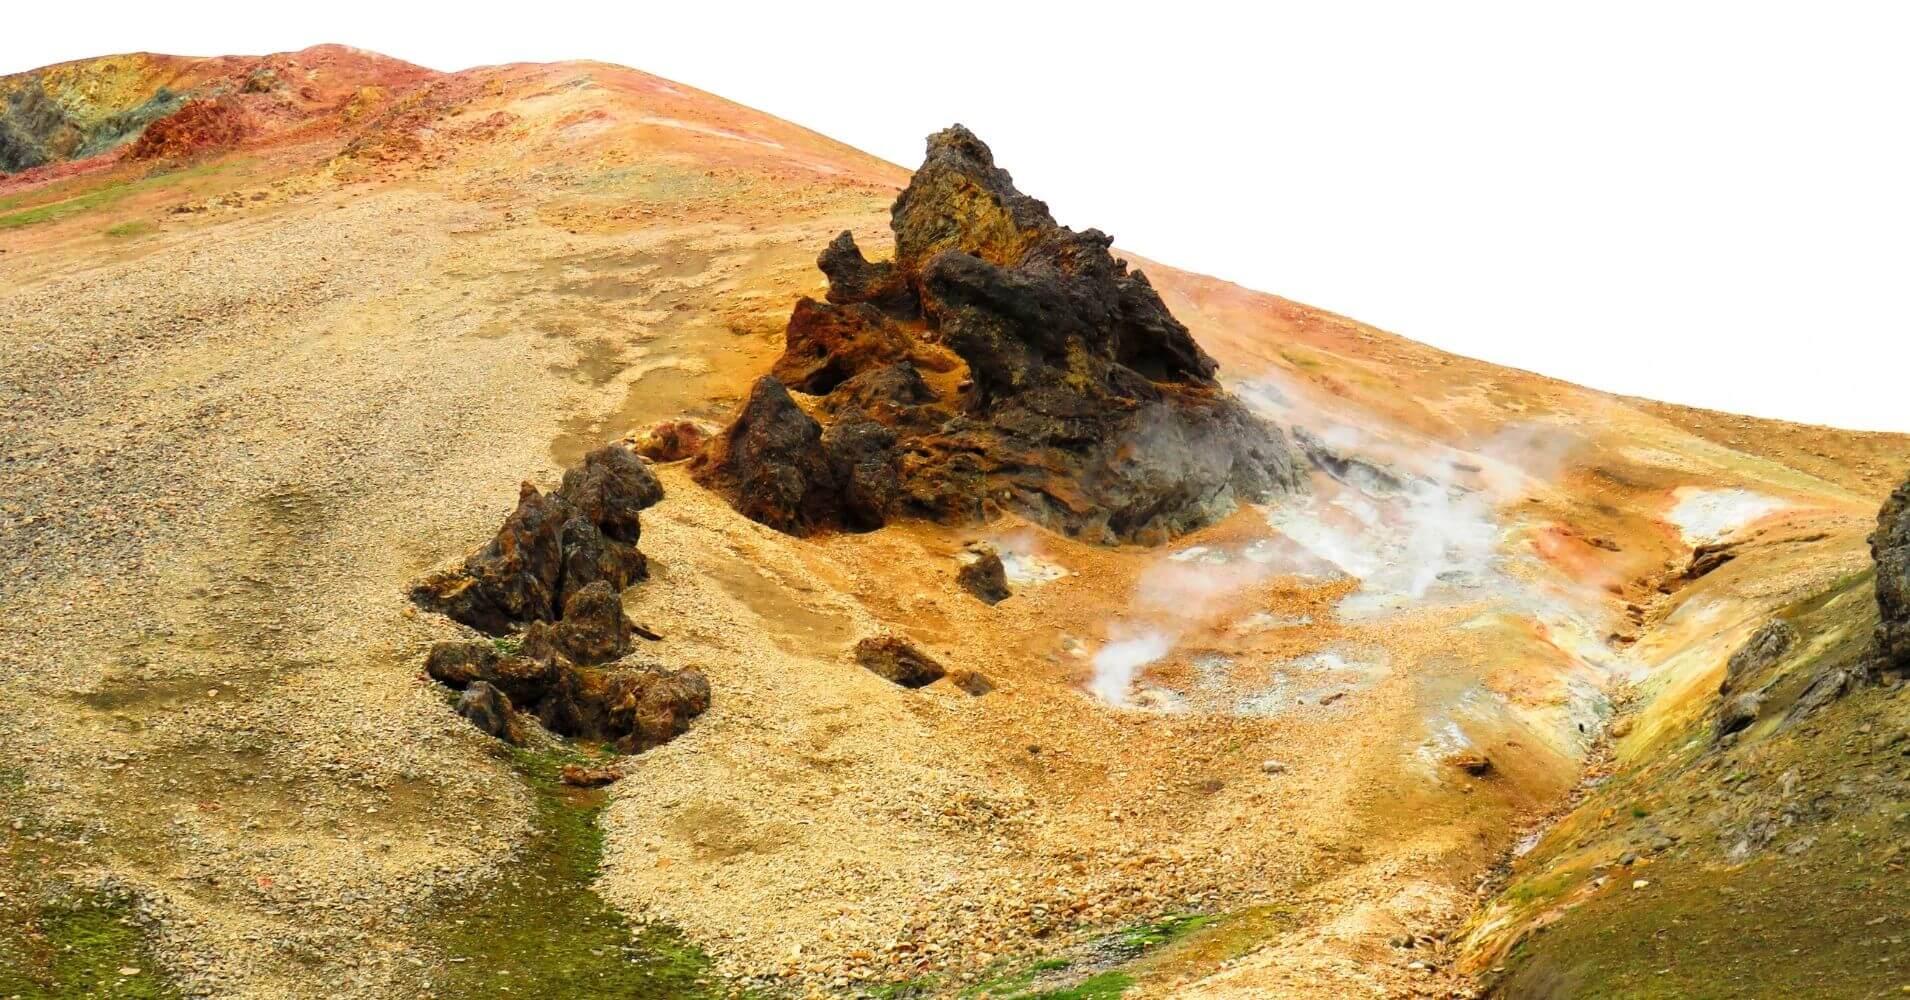 Volcán Hekla. Landmannalaugar Tierras Altas de Islandia.